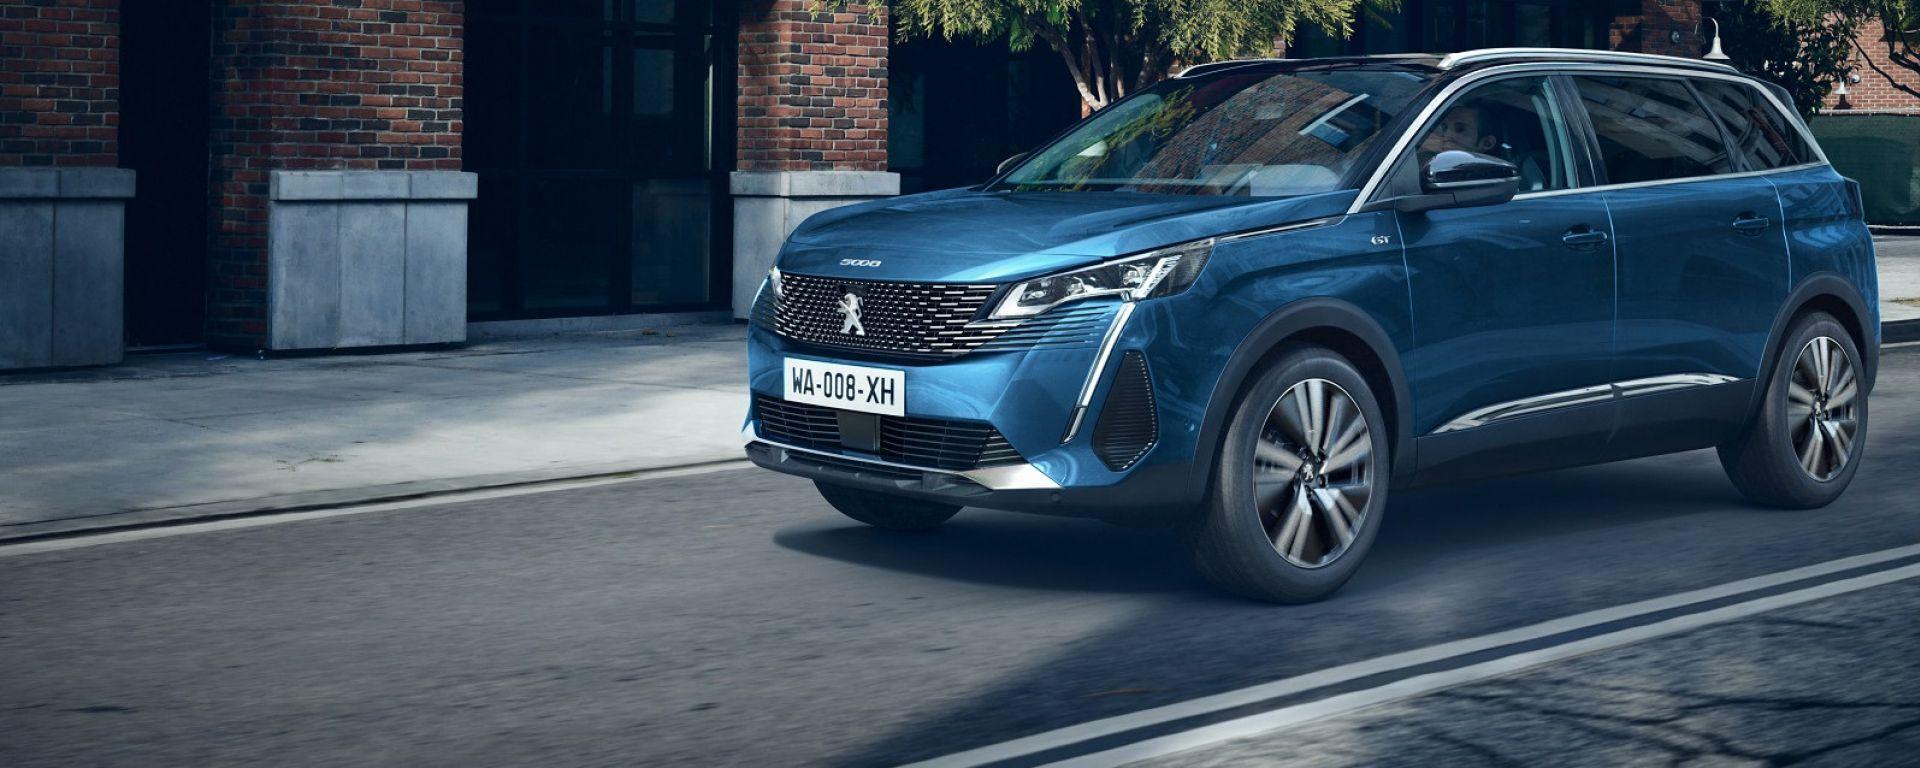 Nuova Peugeot 5008, prezzi da 31.750 euro